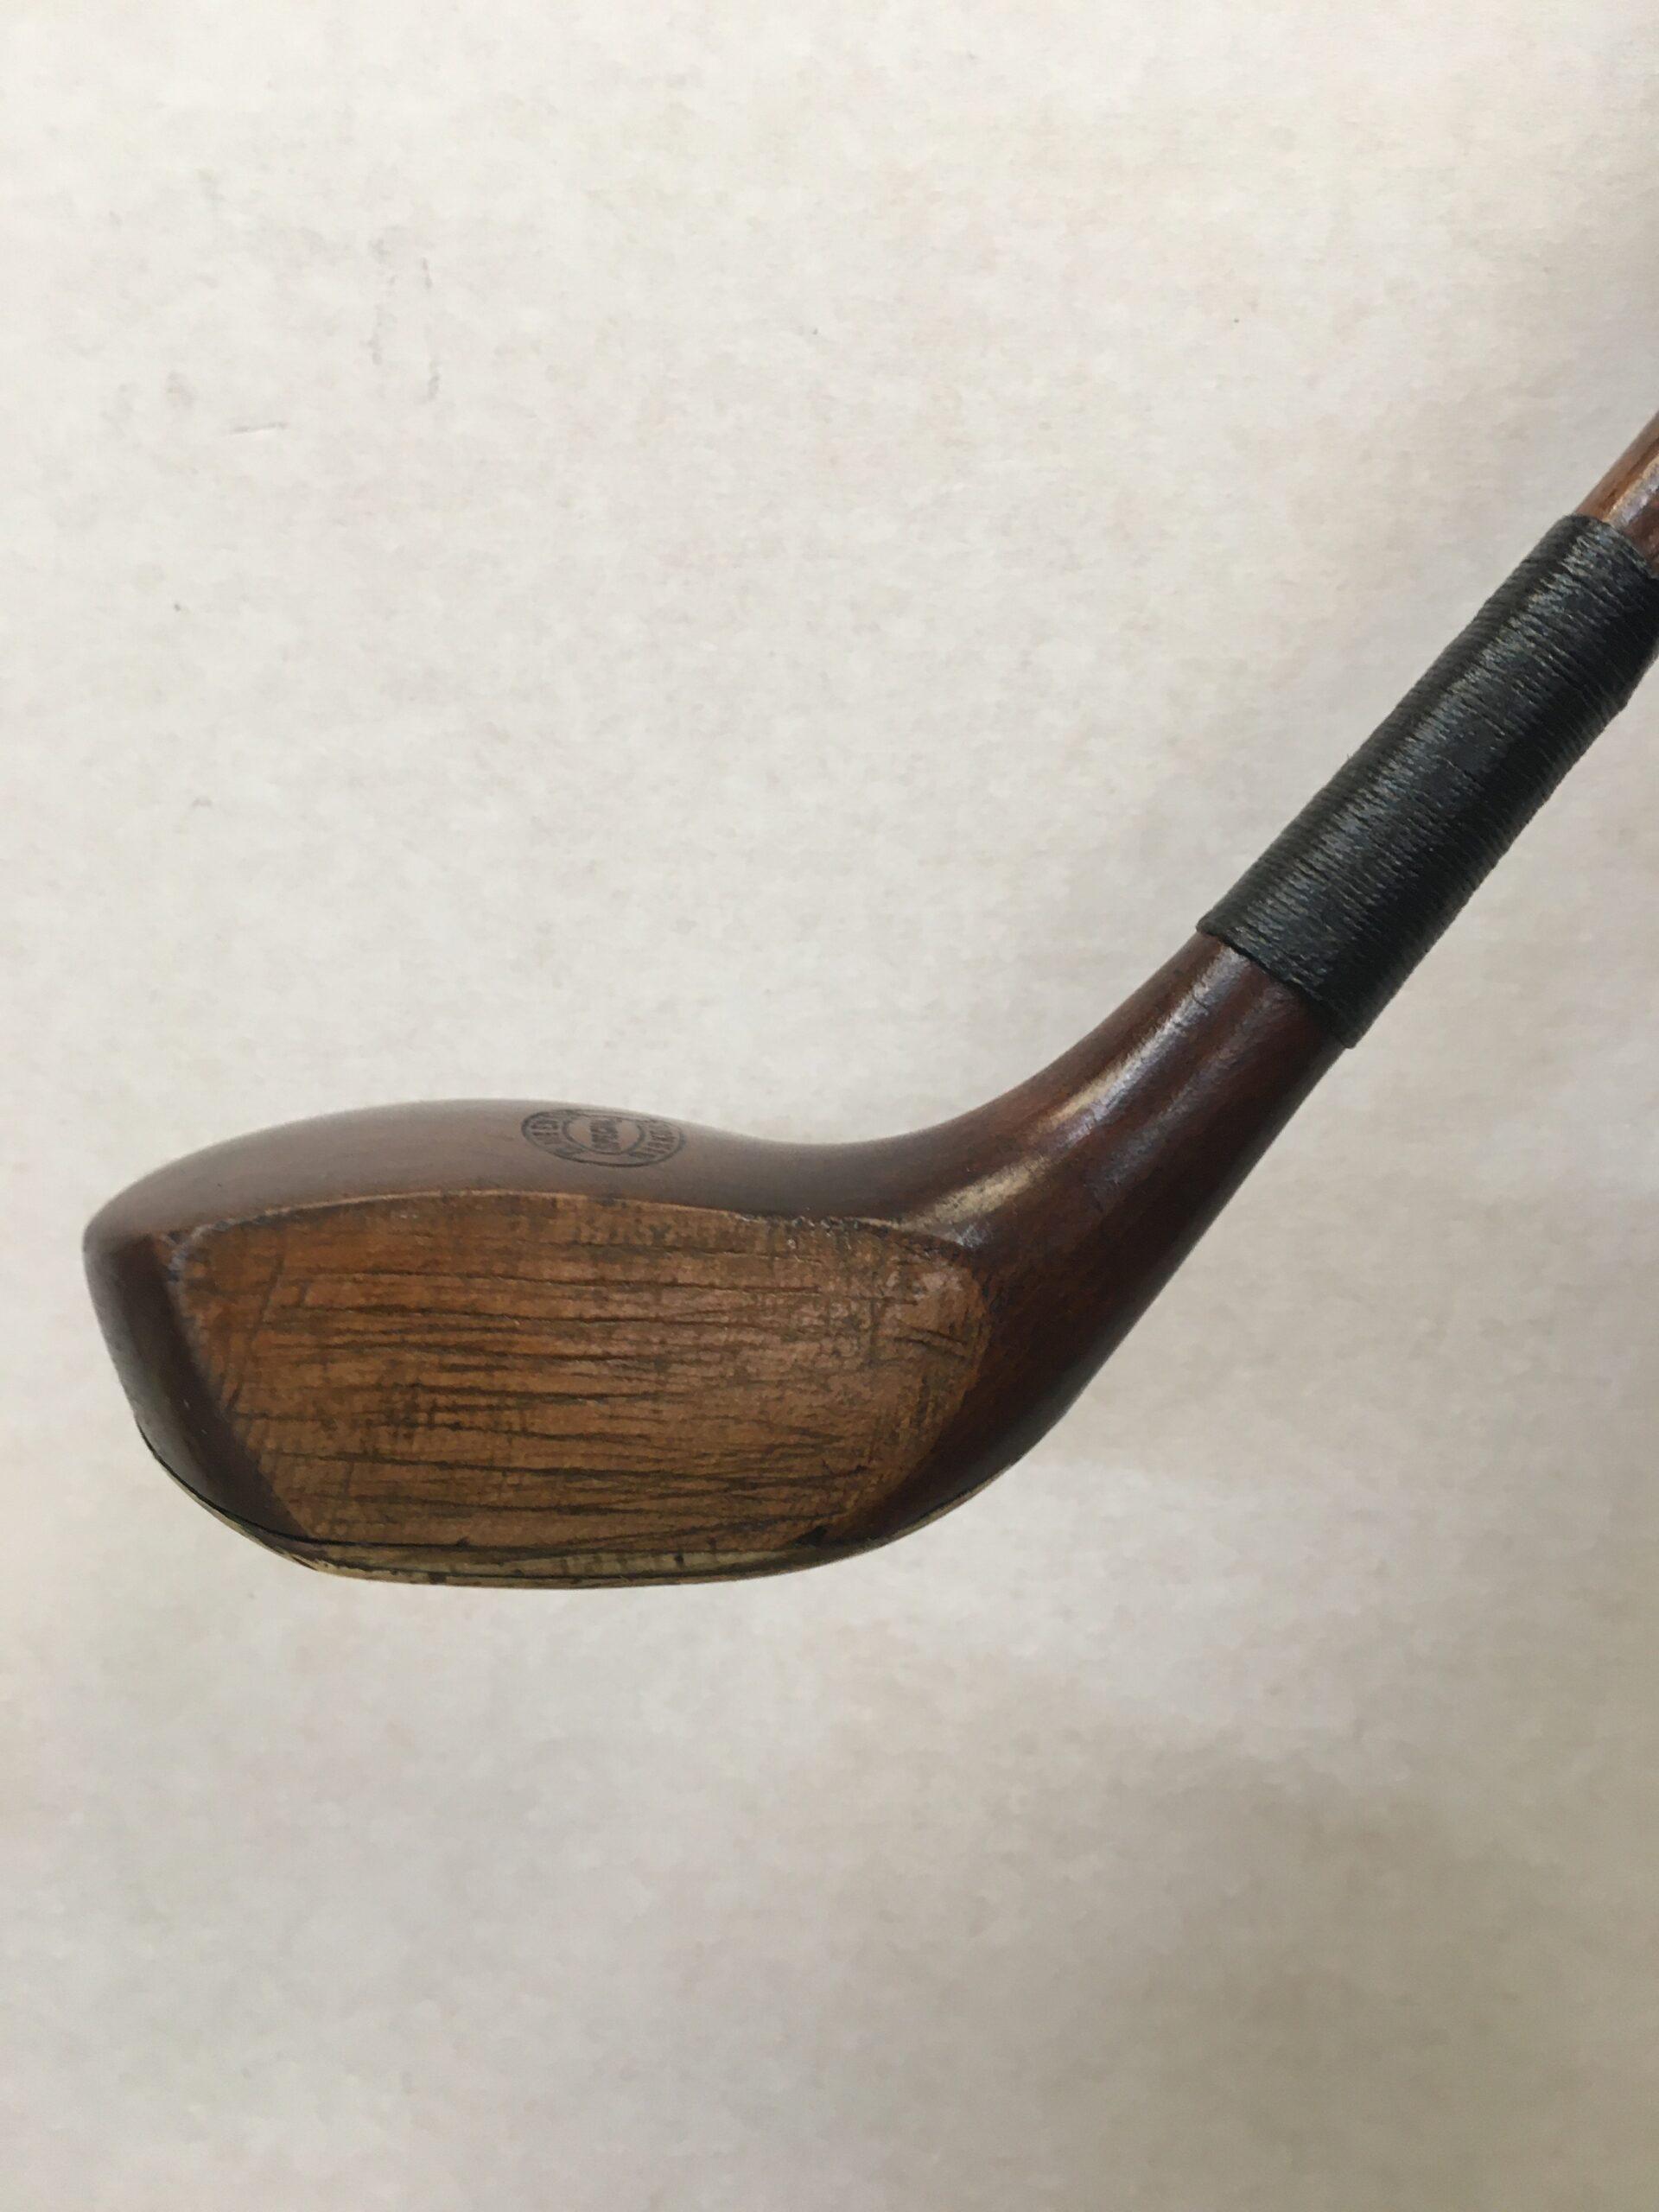 D. McEwan Fairway Wood/Wooden Cleek